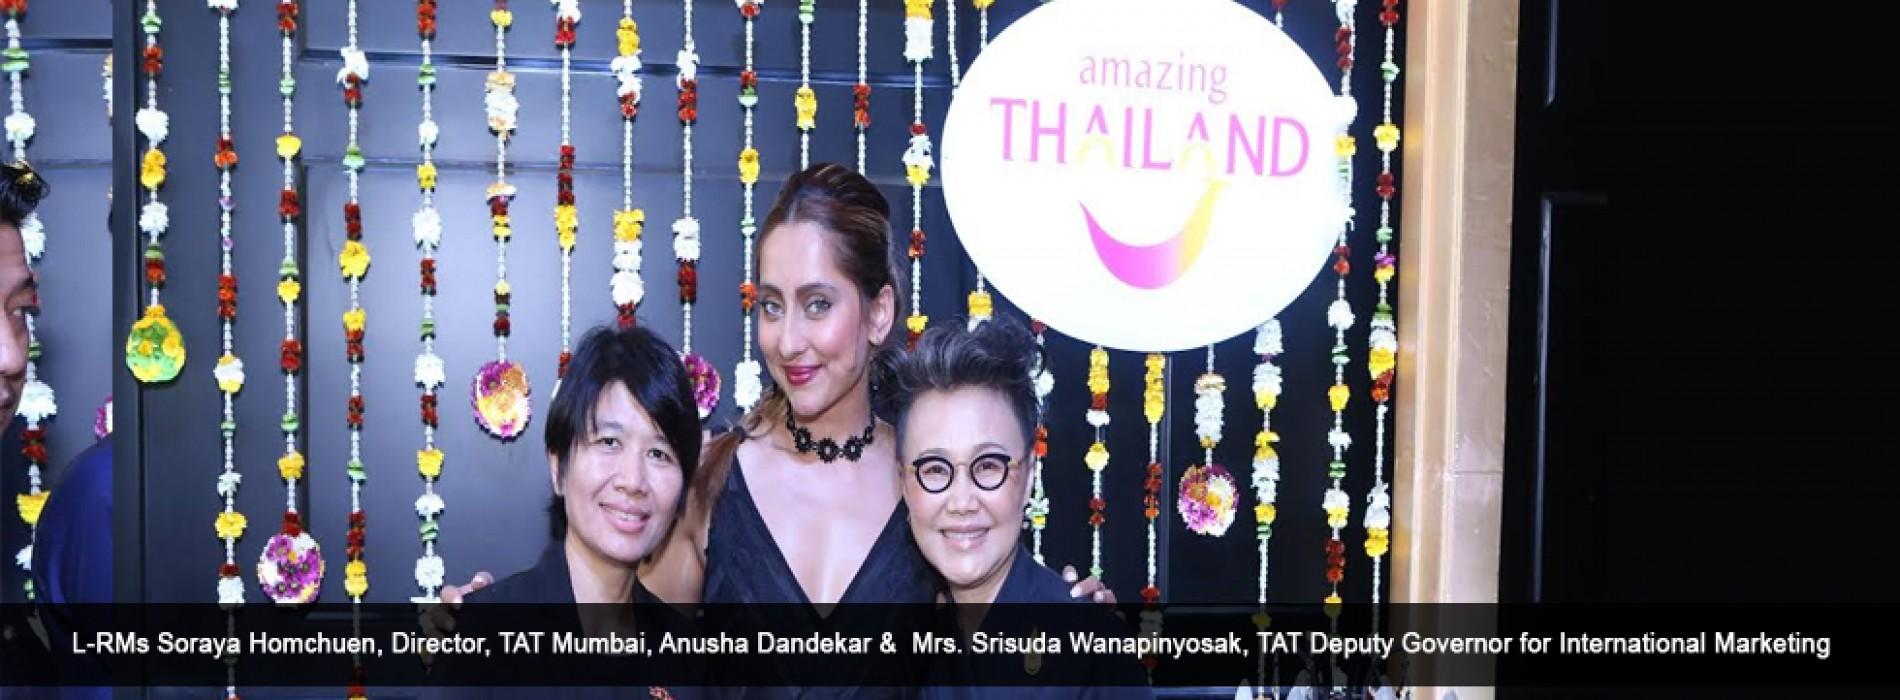 Amazing Thailand hosts a press meet with TAT Deputy Governor and brand ambassador Anusha Dandekar